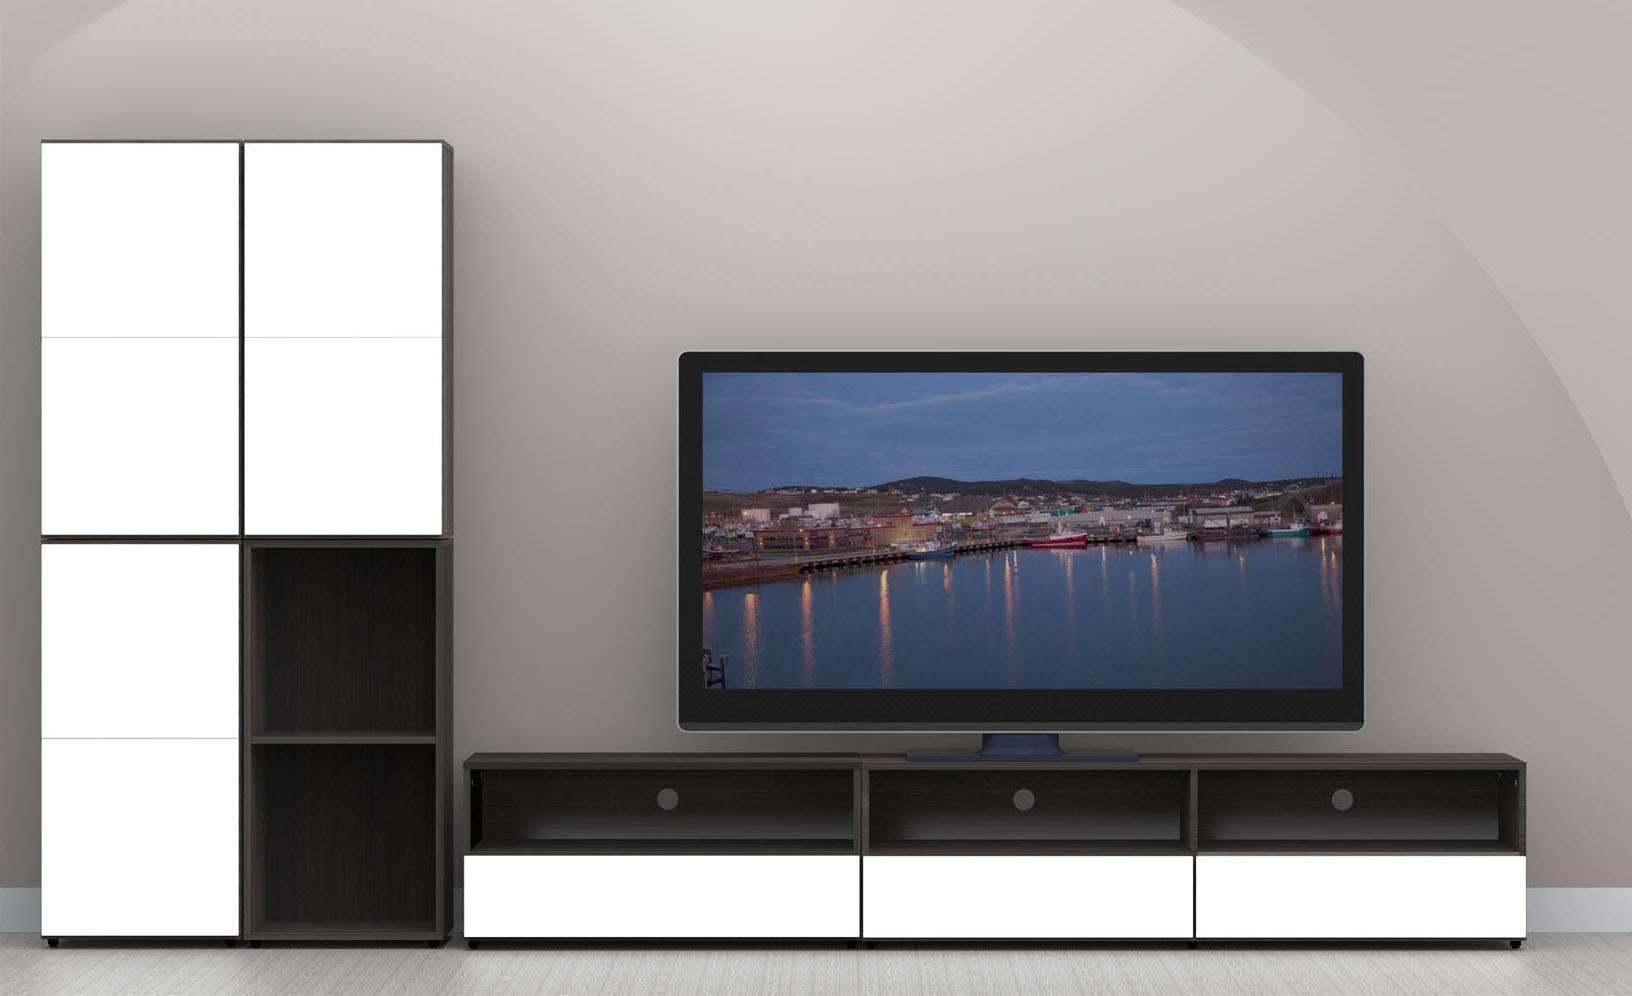 Nexera Allure 60 In Tv Stand N 220133 With Regard To Nexera Tv Stands (View 5 of 15)